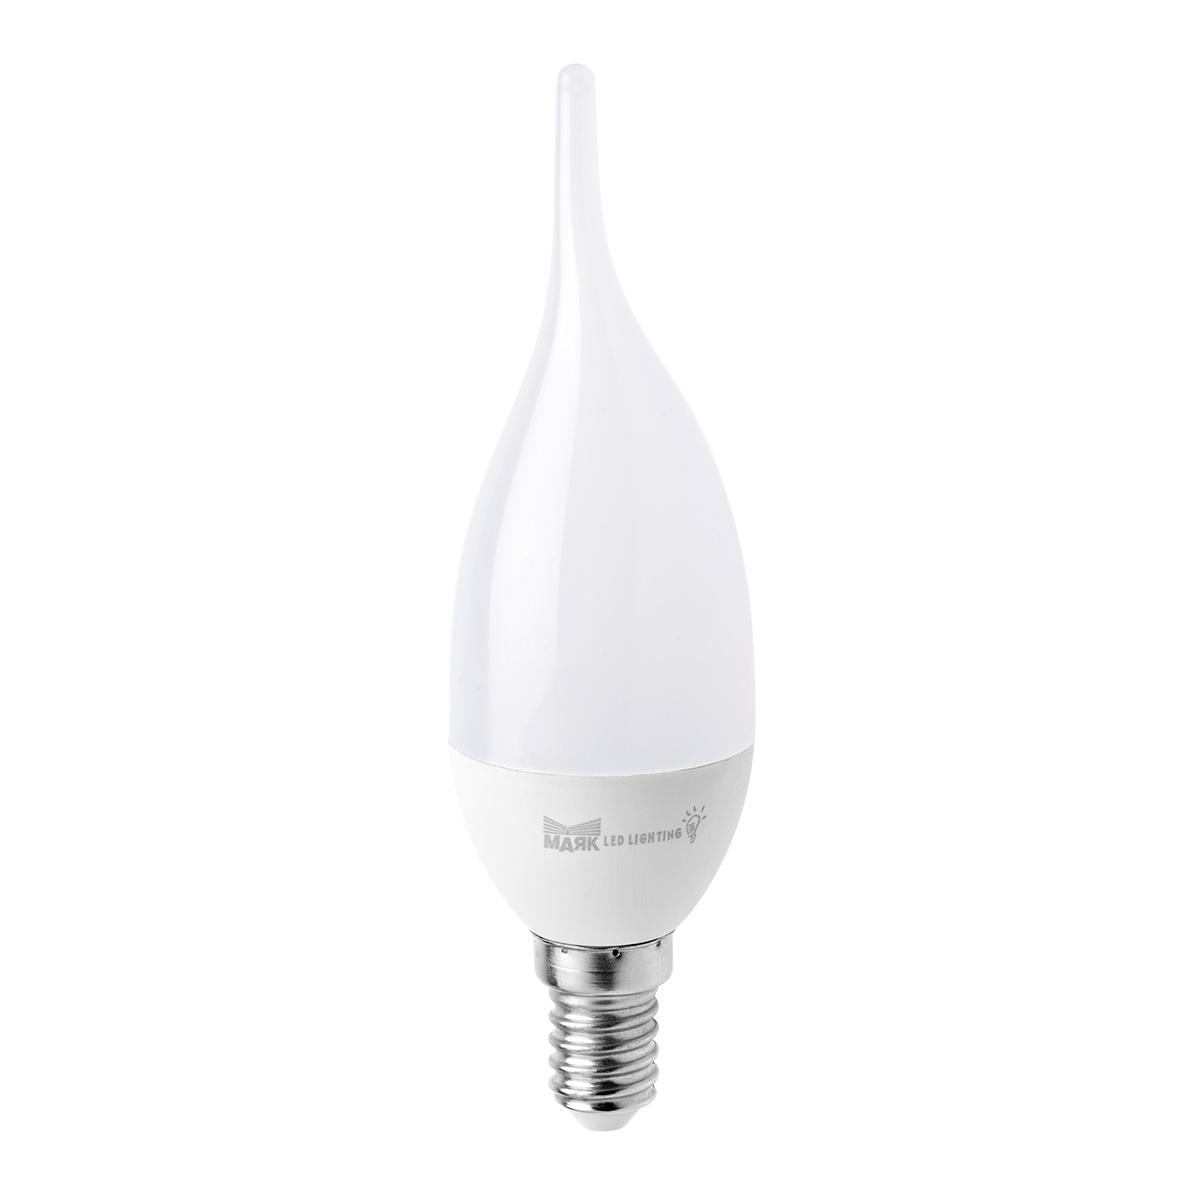 Лампа светодиодная МАЯК C30l/e14/6w/3000k 30 11 30 3000